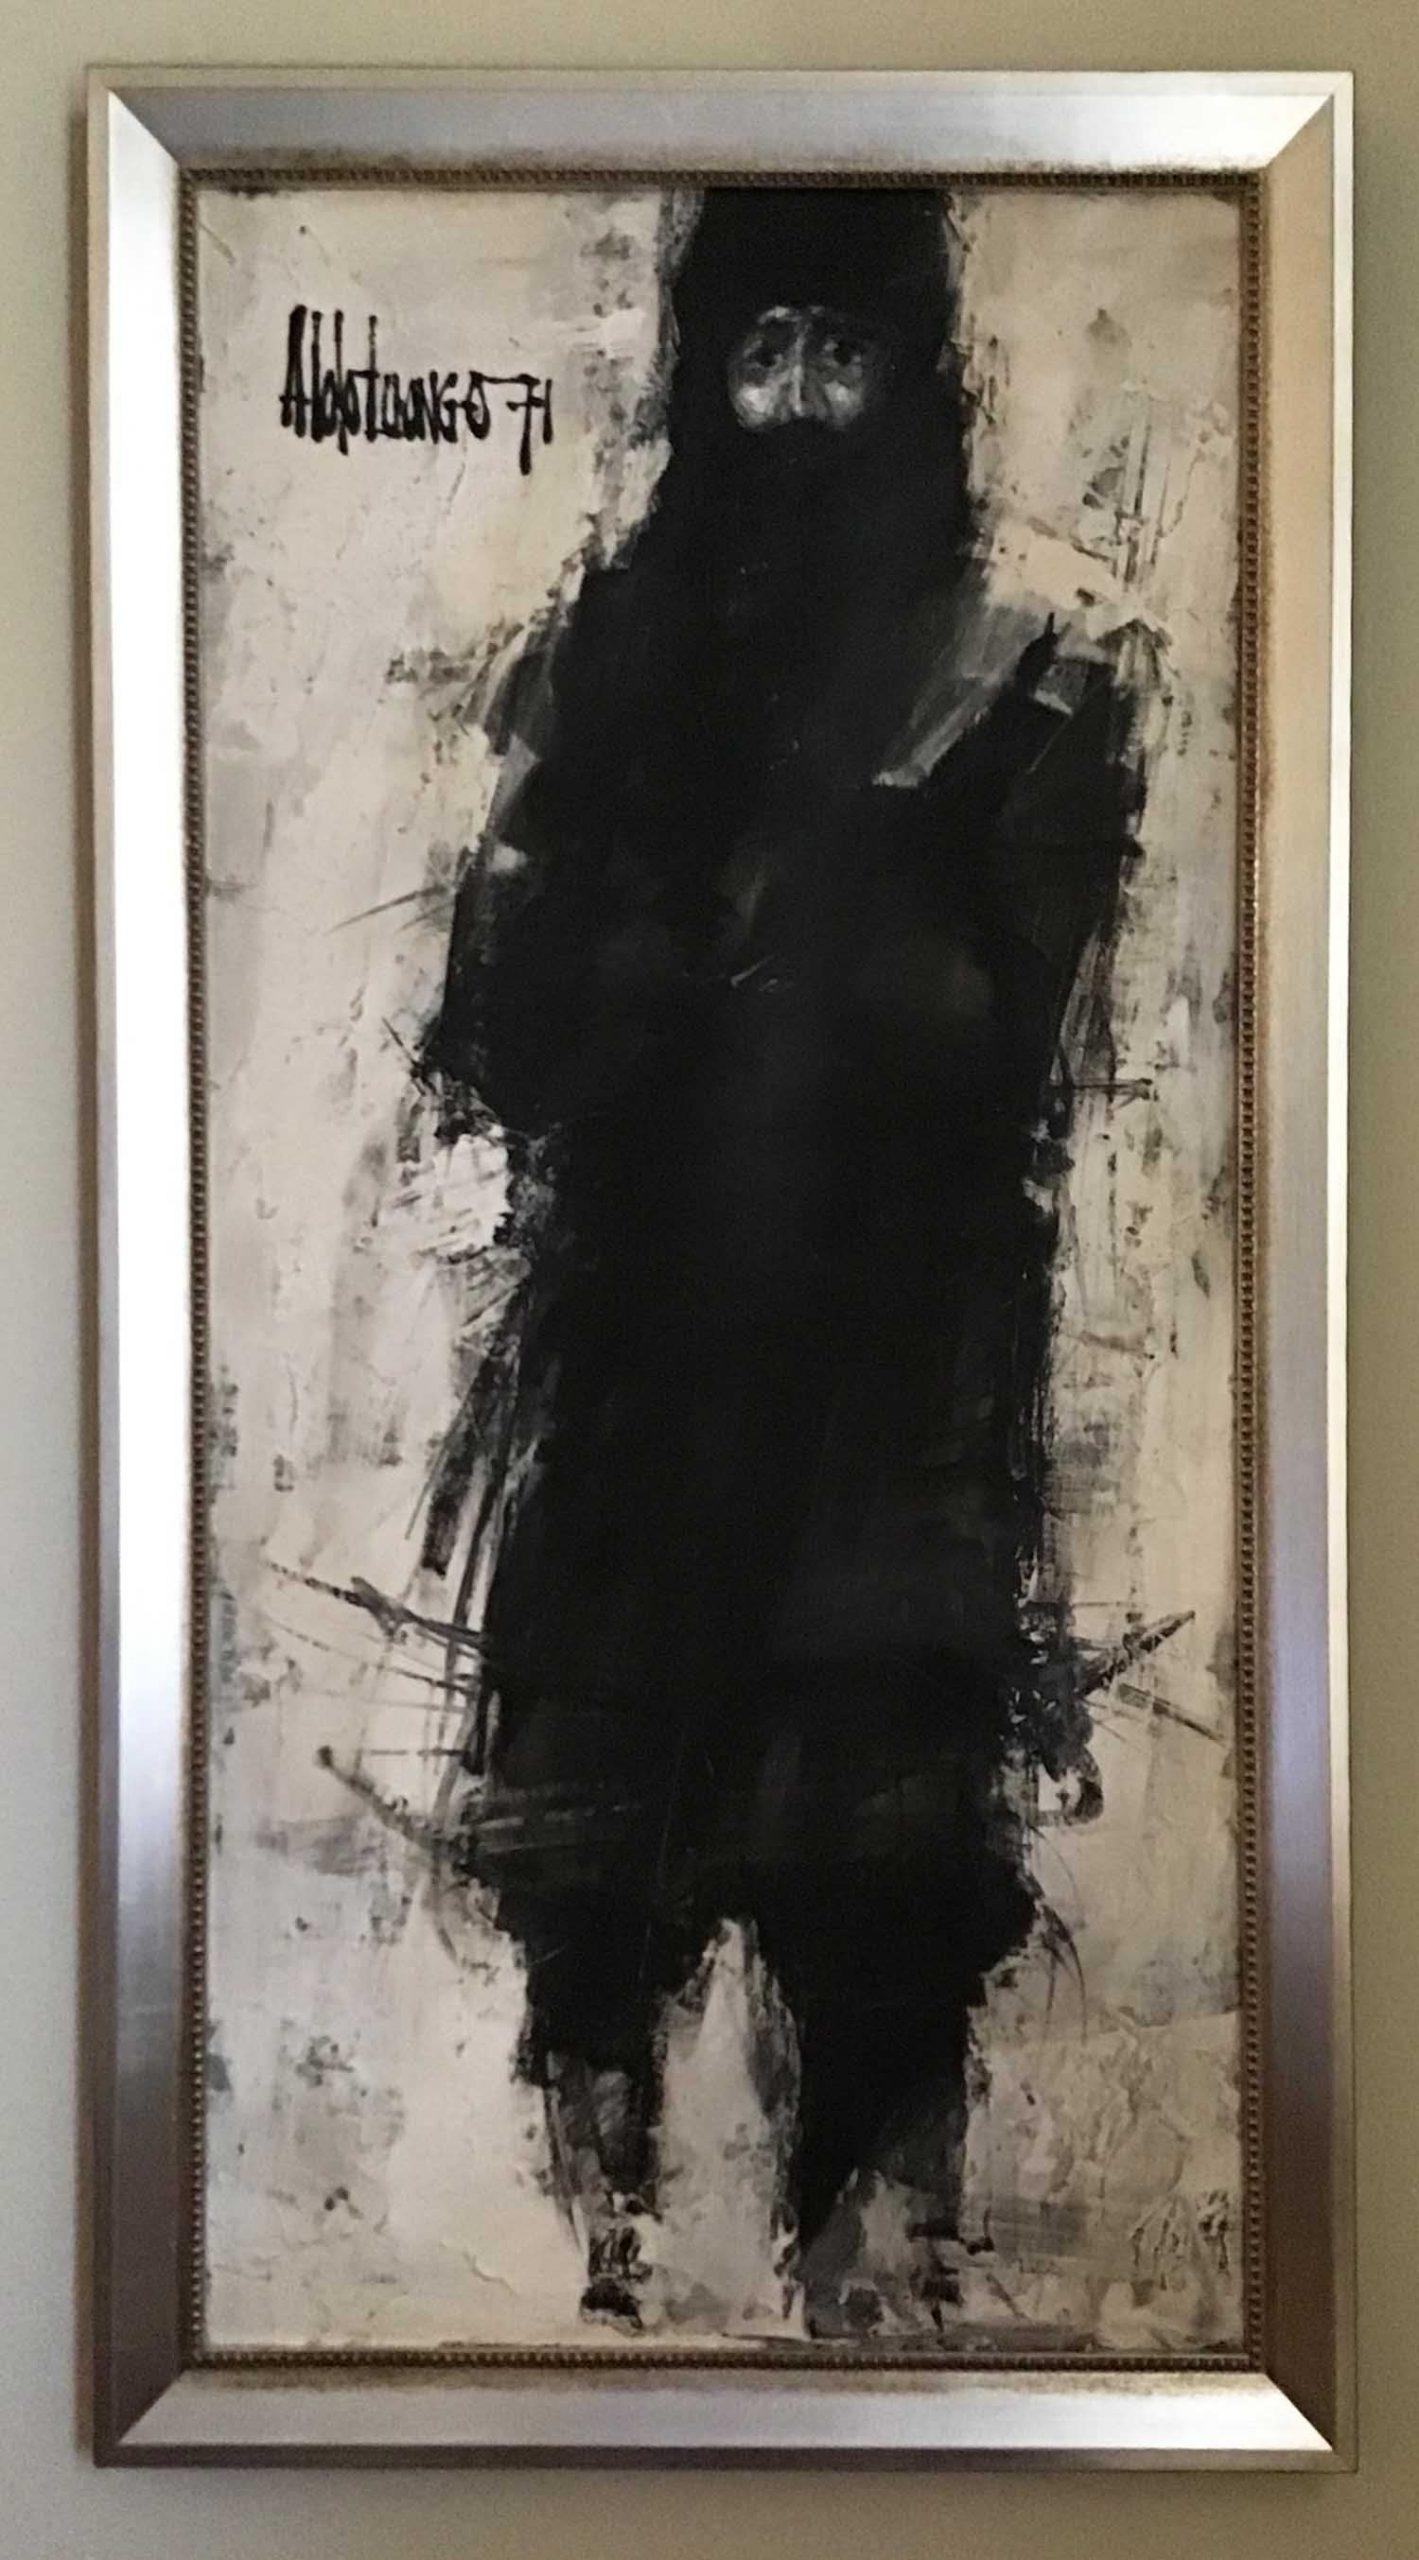 Aldo Luongo, Oil on Canvas, Man in Black, Signed 1971